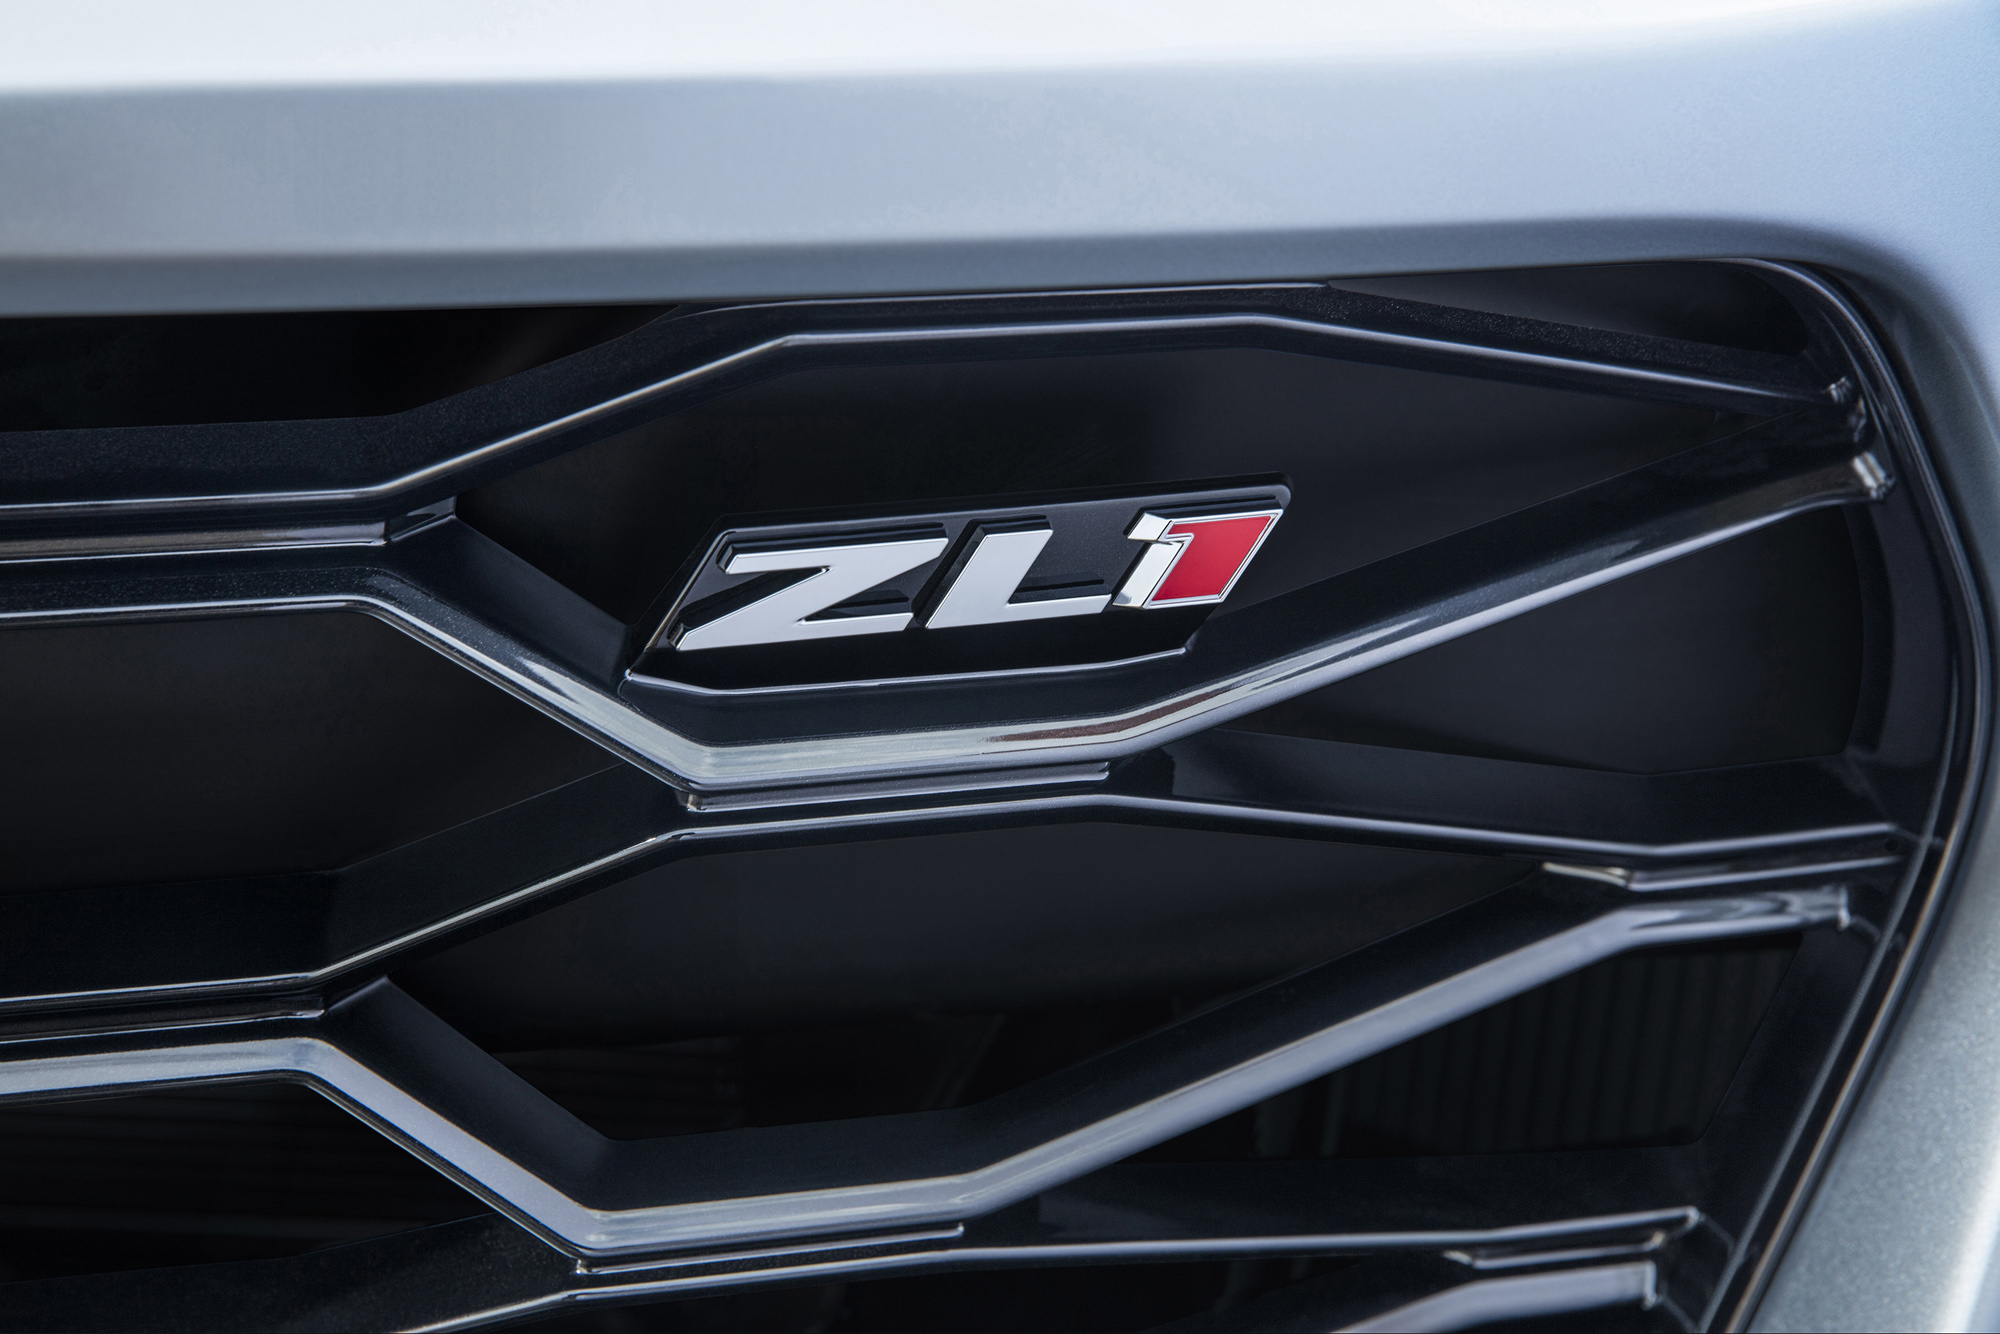 Chevrolet Camaro ZL1 Images